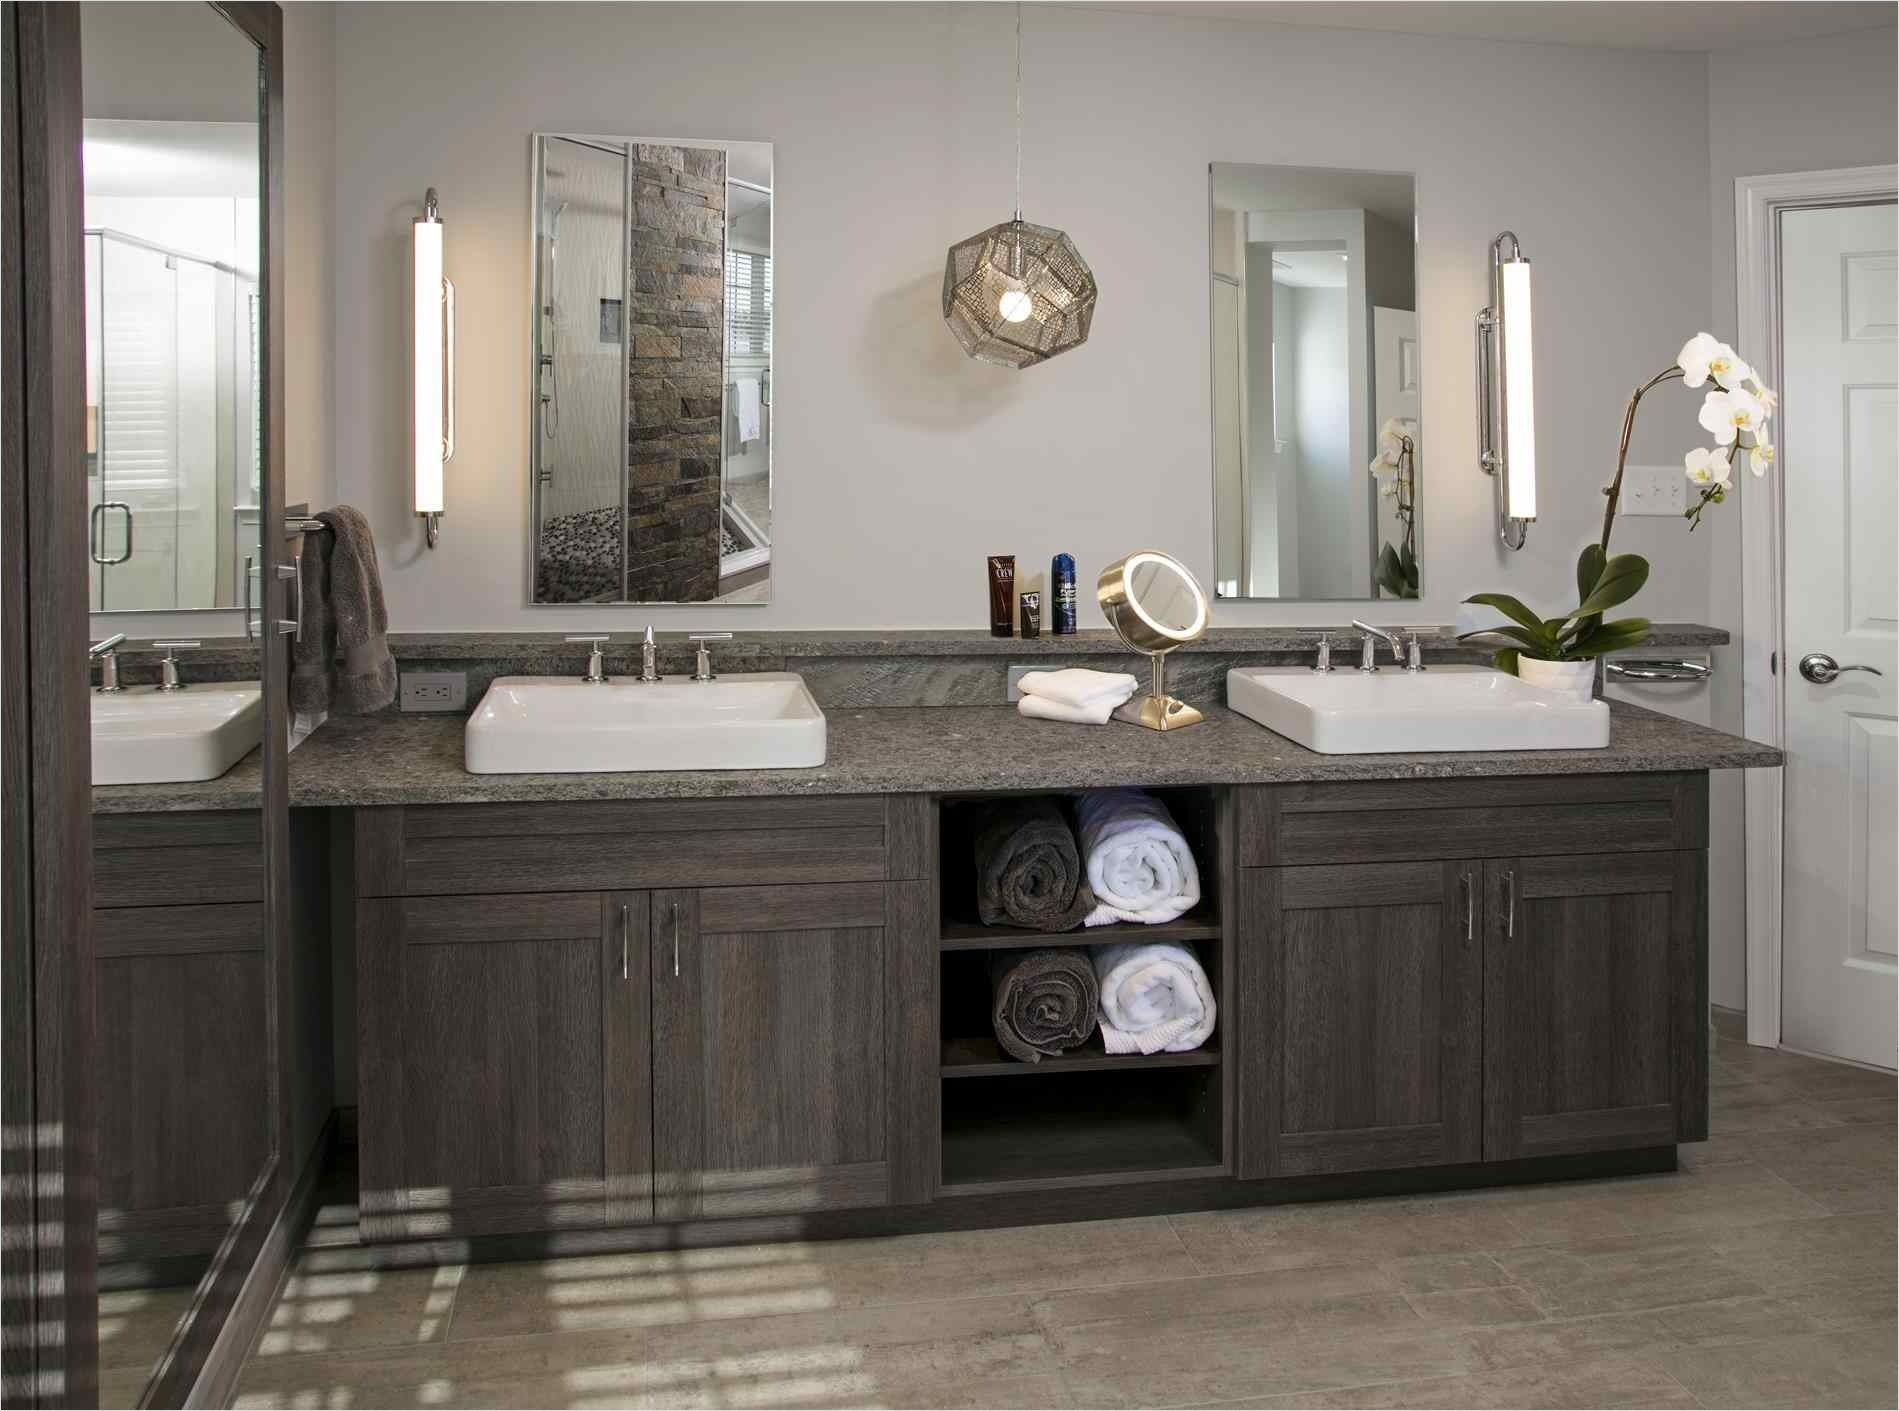 43 Stunning Rustic Modern Bathroom Design Ideas Bathrooms Rustic Master Bathroom Modern Bathroom Design Bathroom